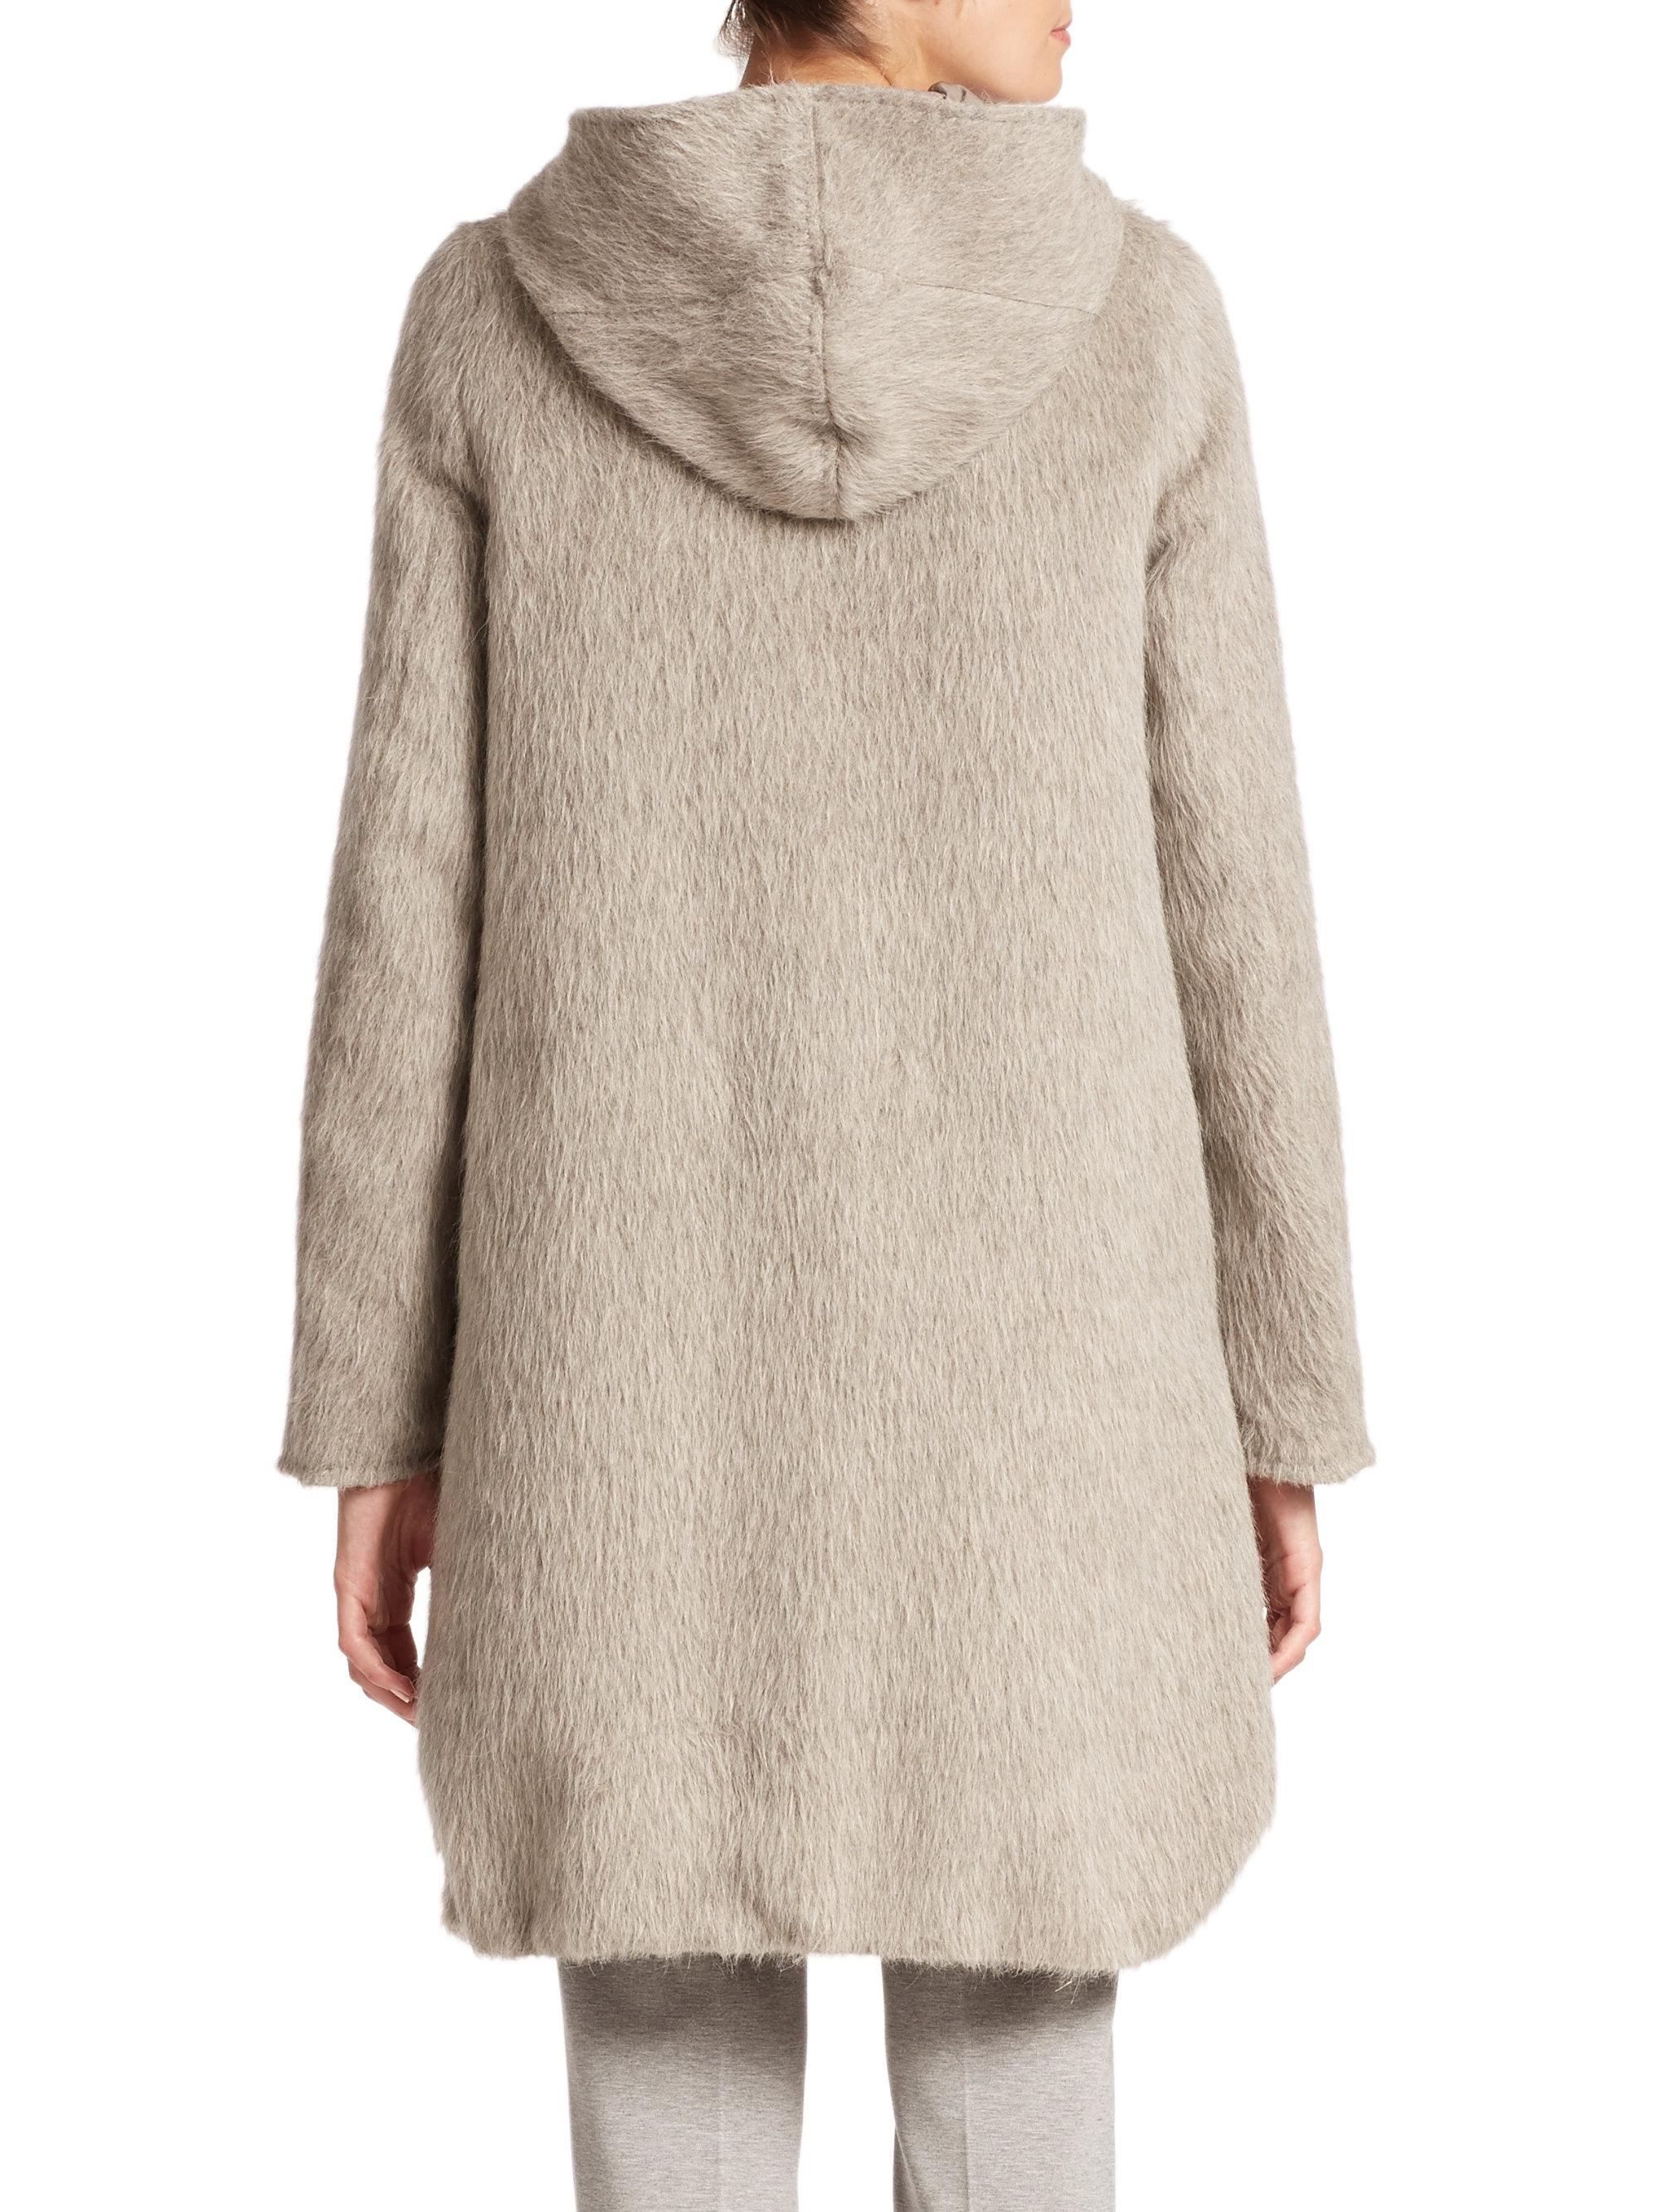 Lyst Max Mara Arles City Reversible Alpaca Coat In Gray